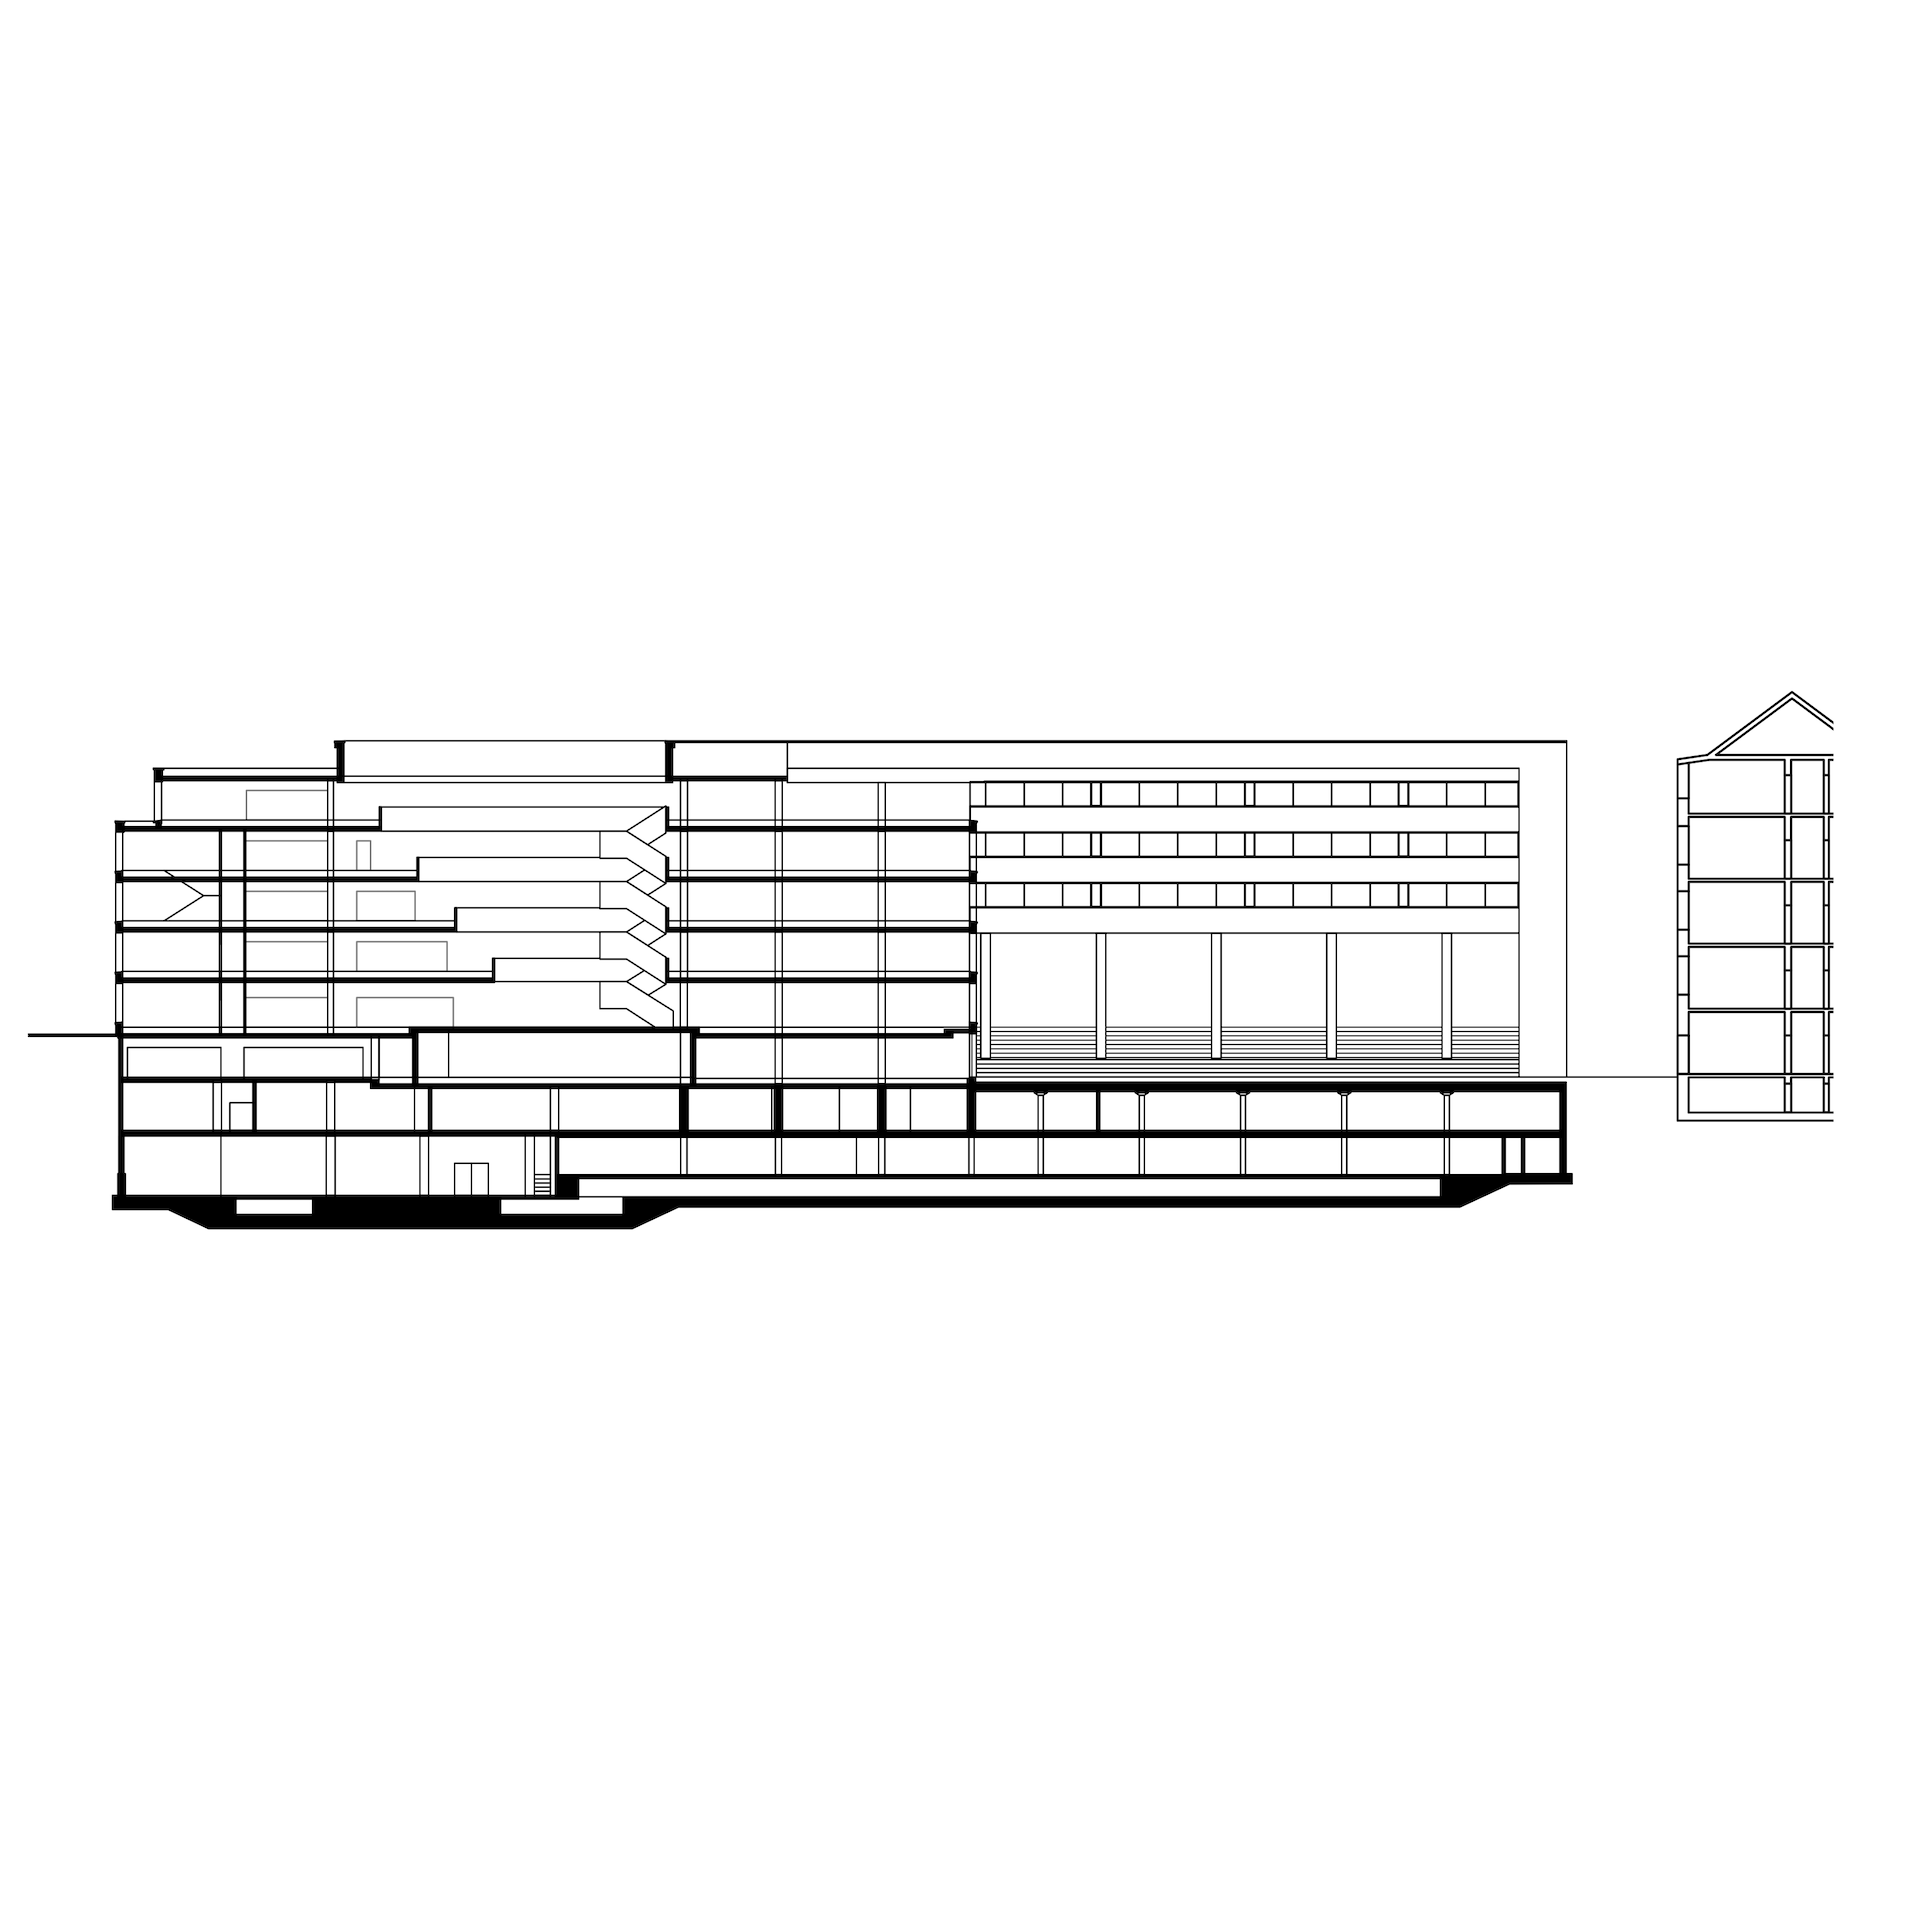 ULB Universitäts Landesbibliothek Darmstadt library building architecture design plan